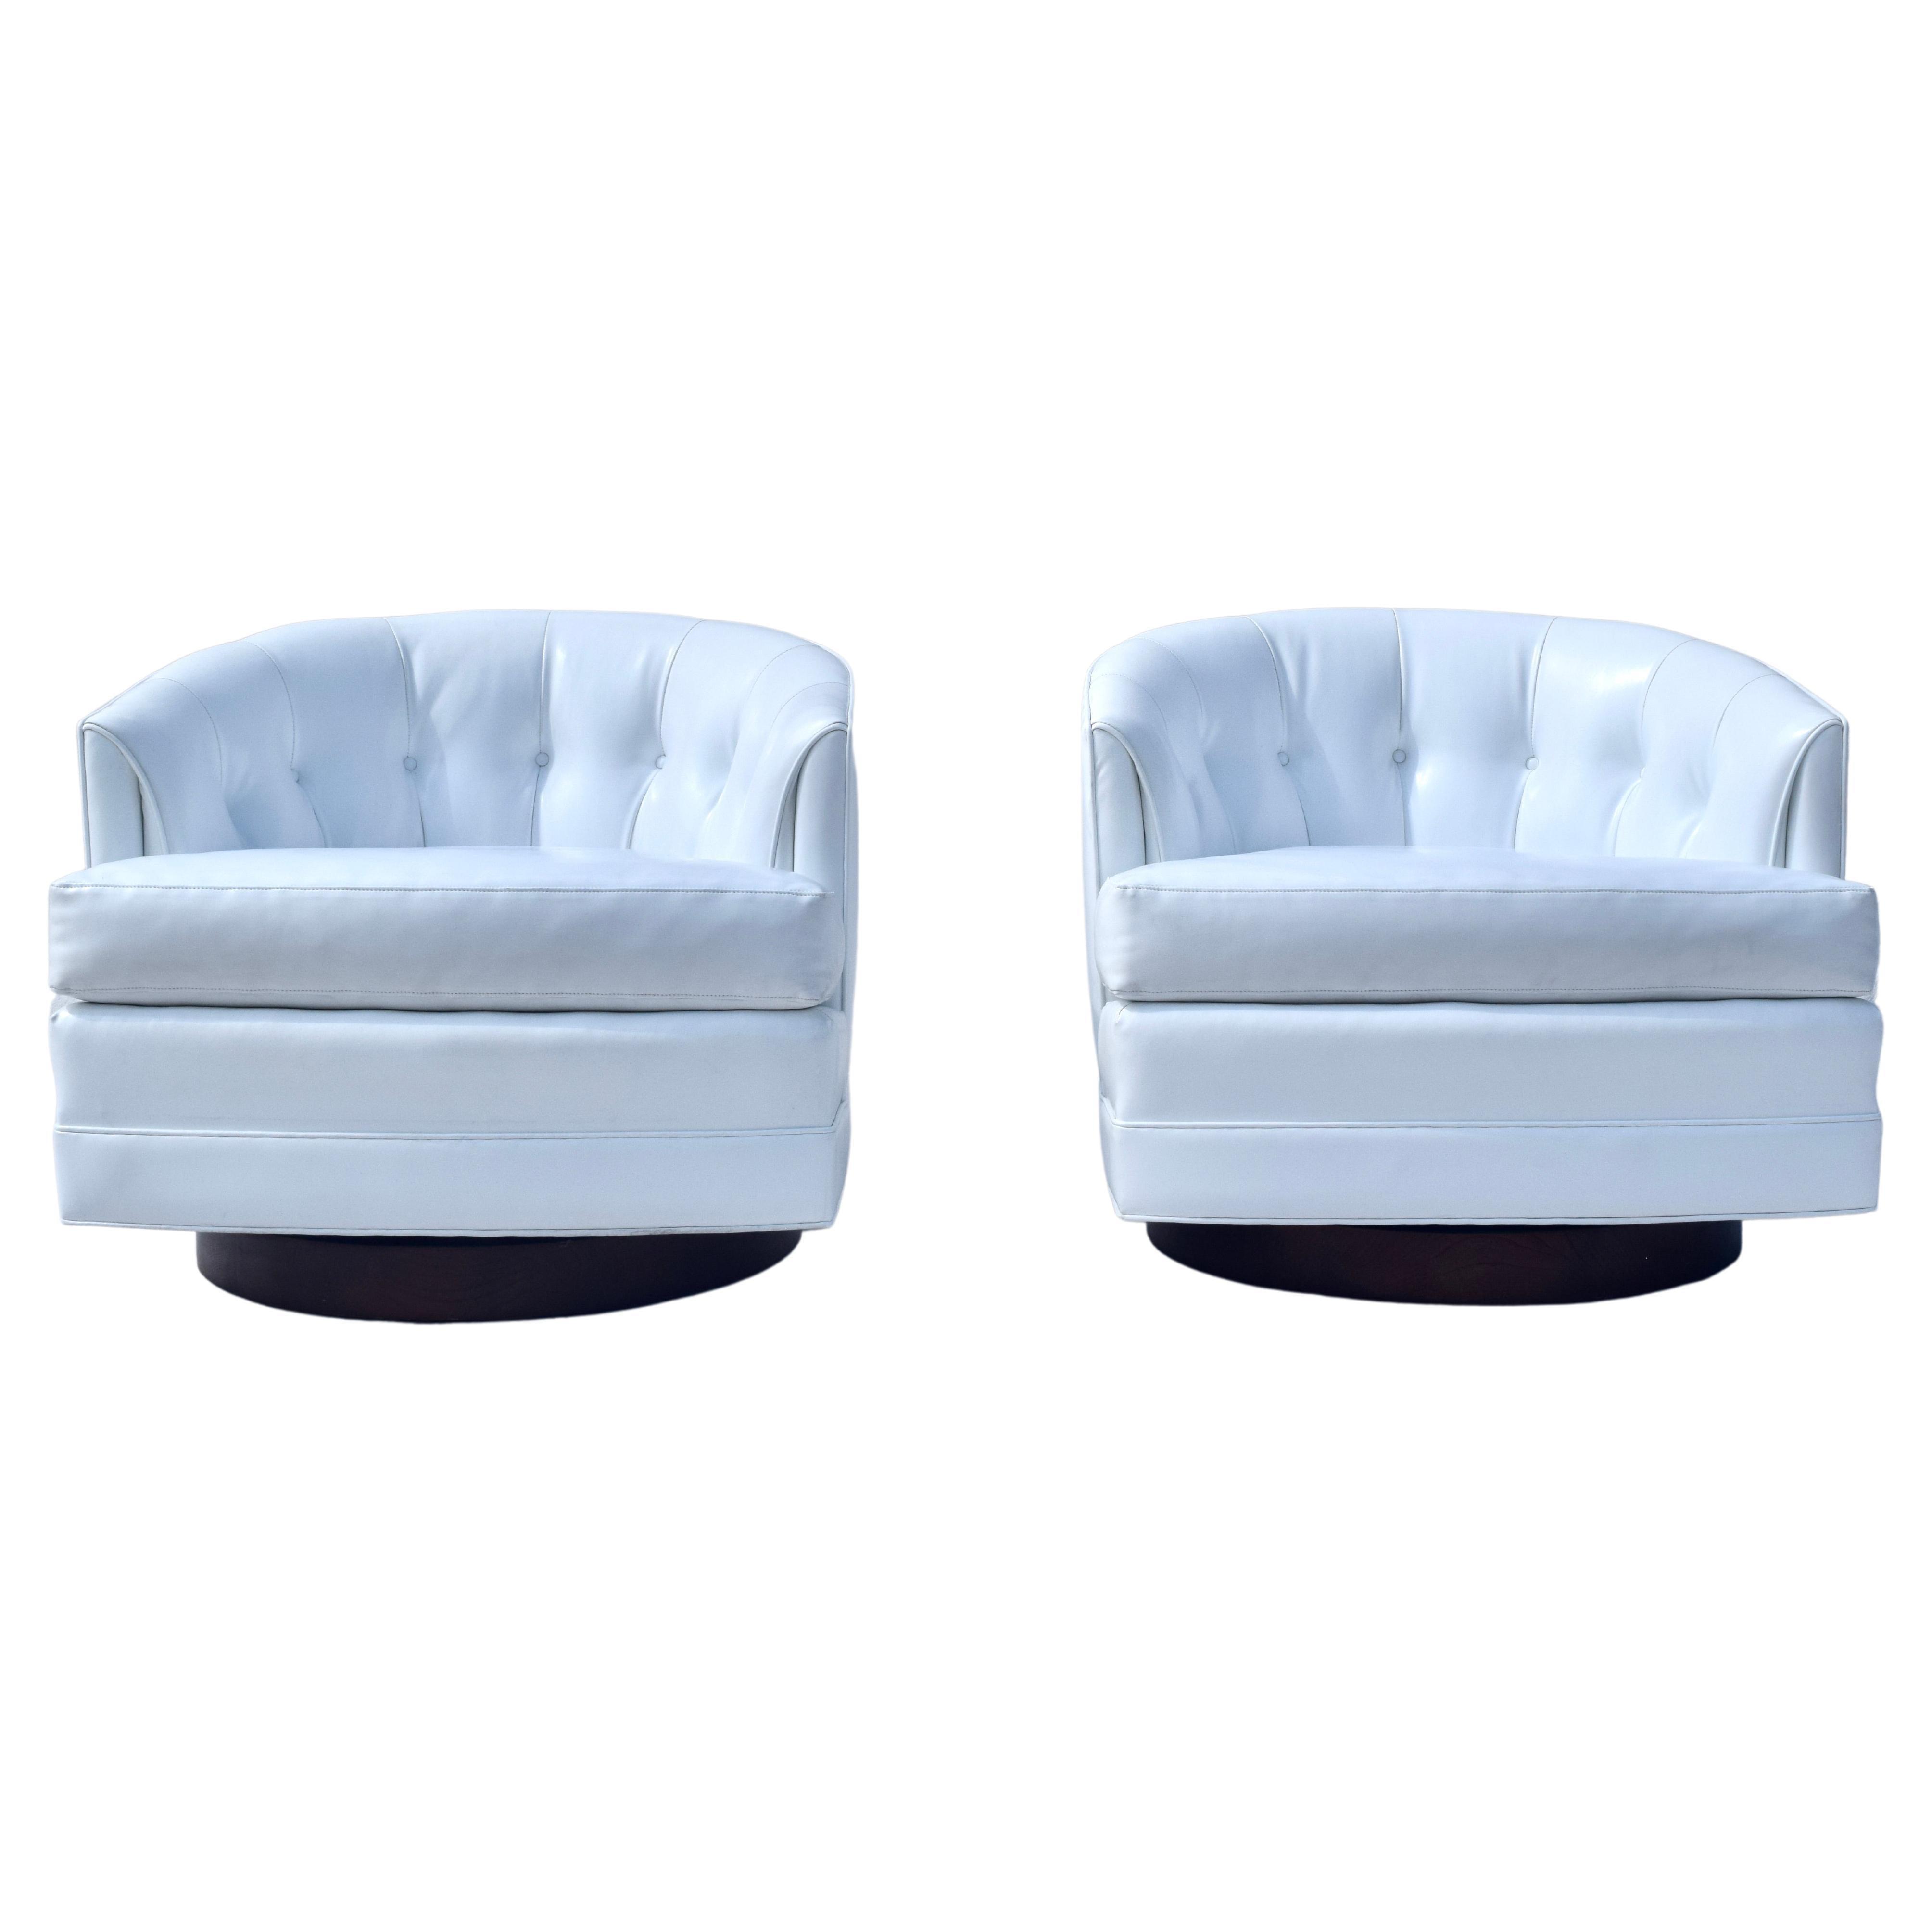 1970's Milo Baughman Swivel Lounge Chairs